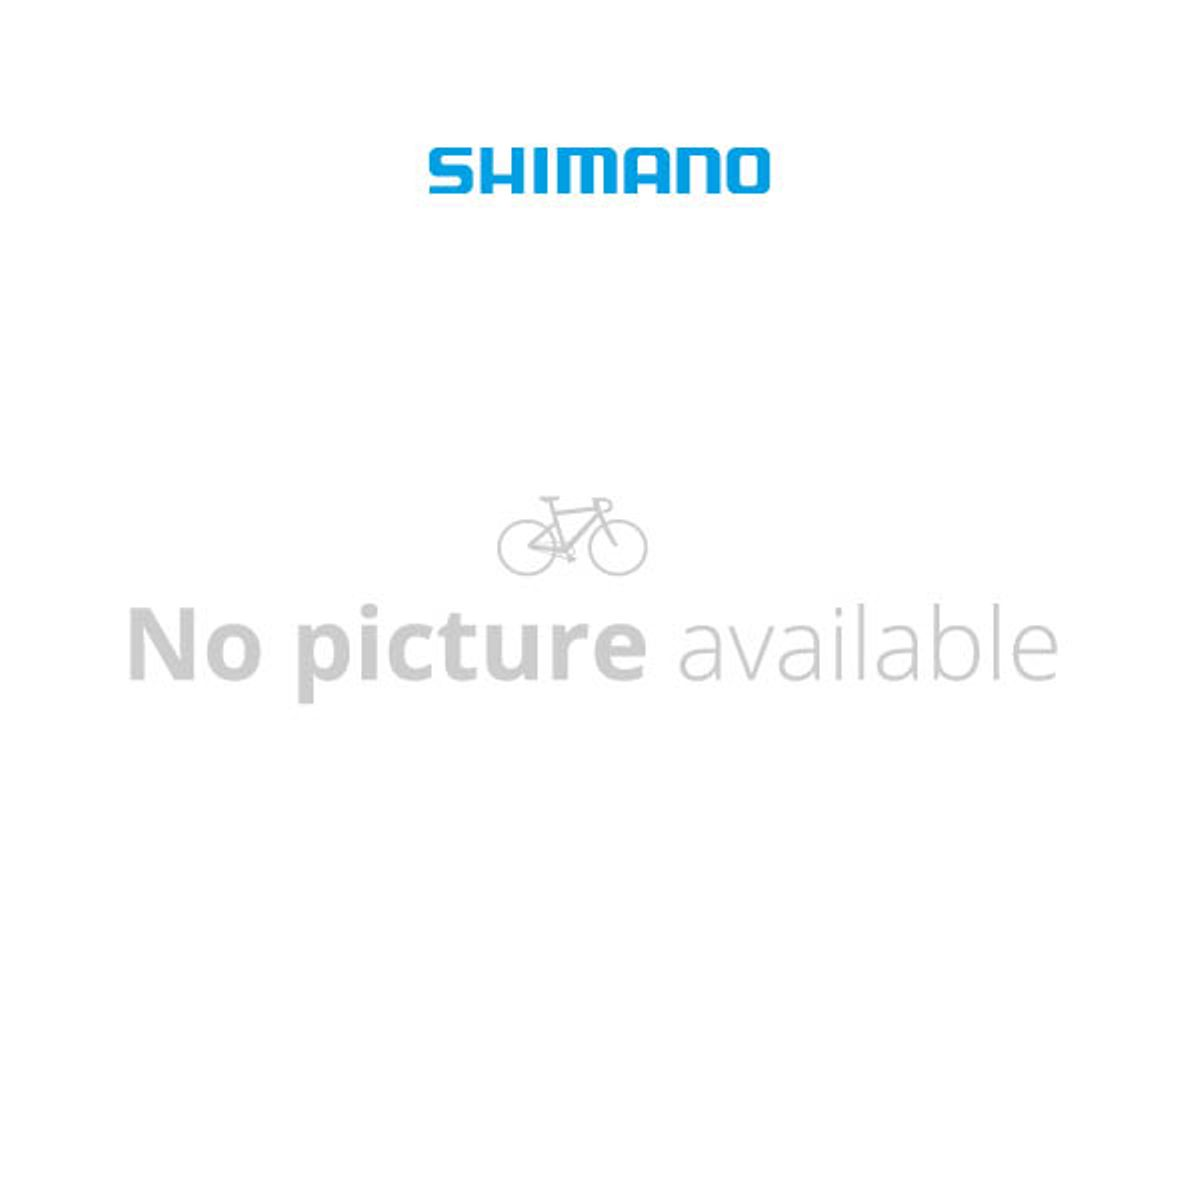 Derailleurwielset Shimano RD-M663 SLX 10-speed